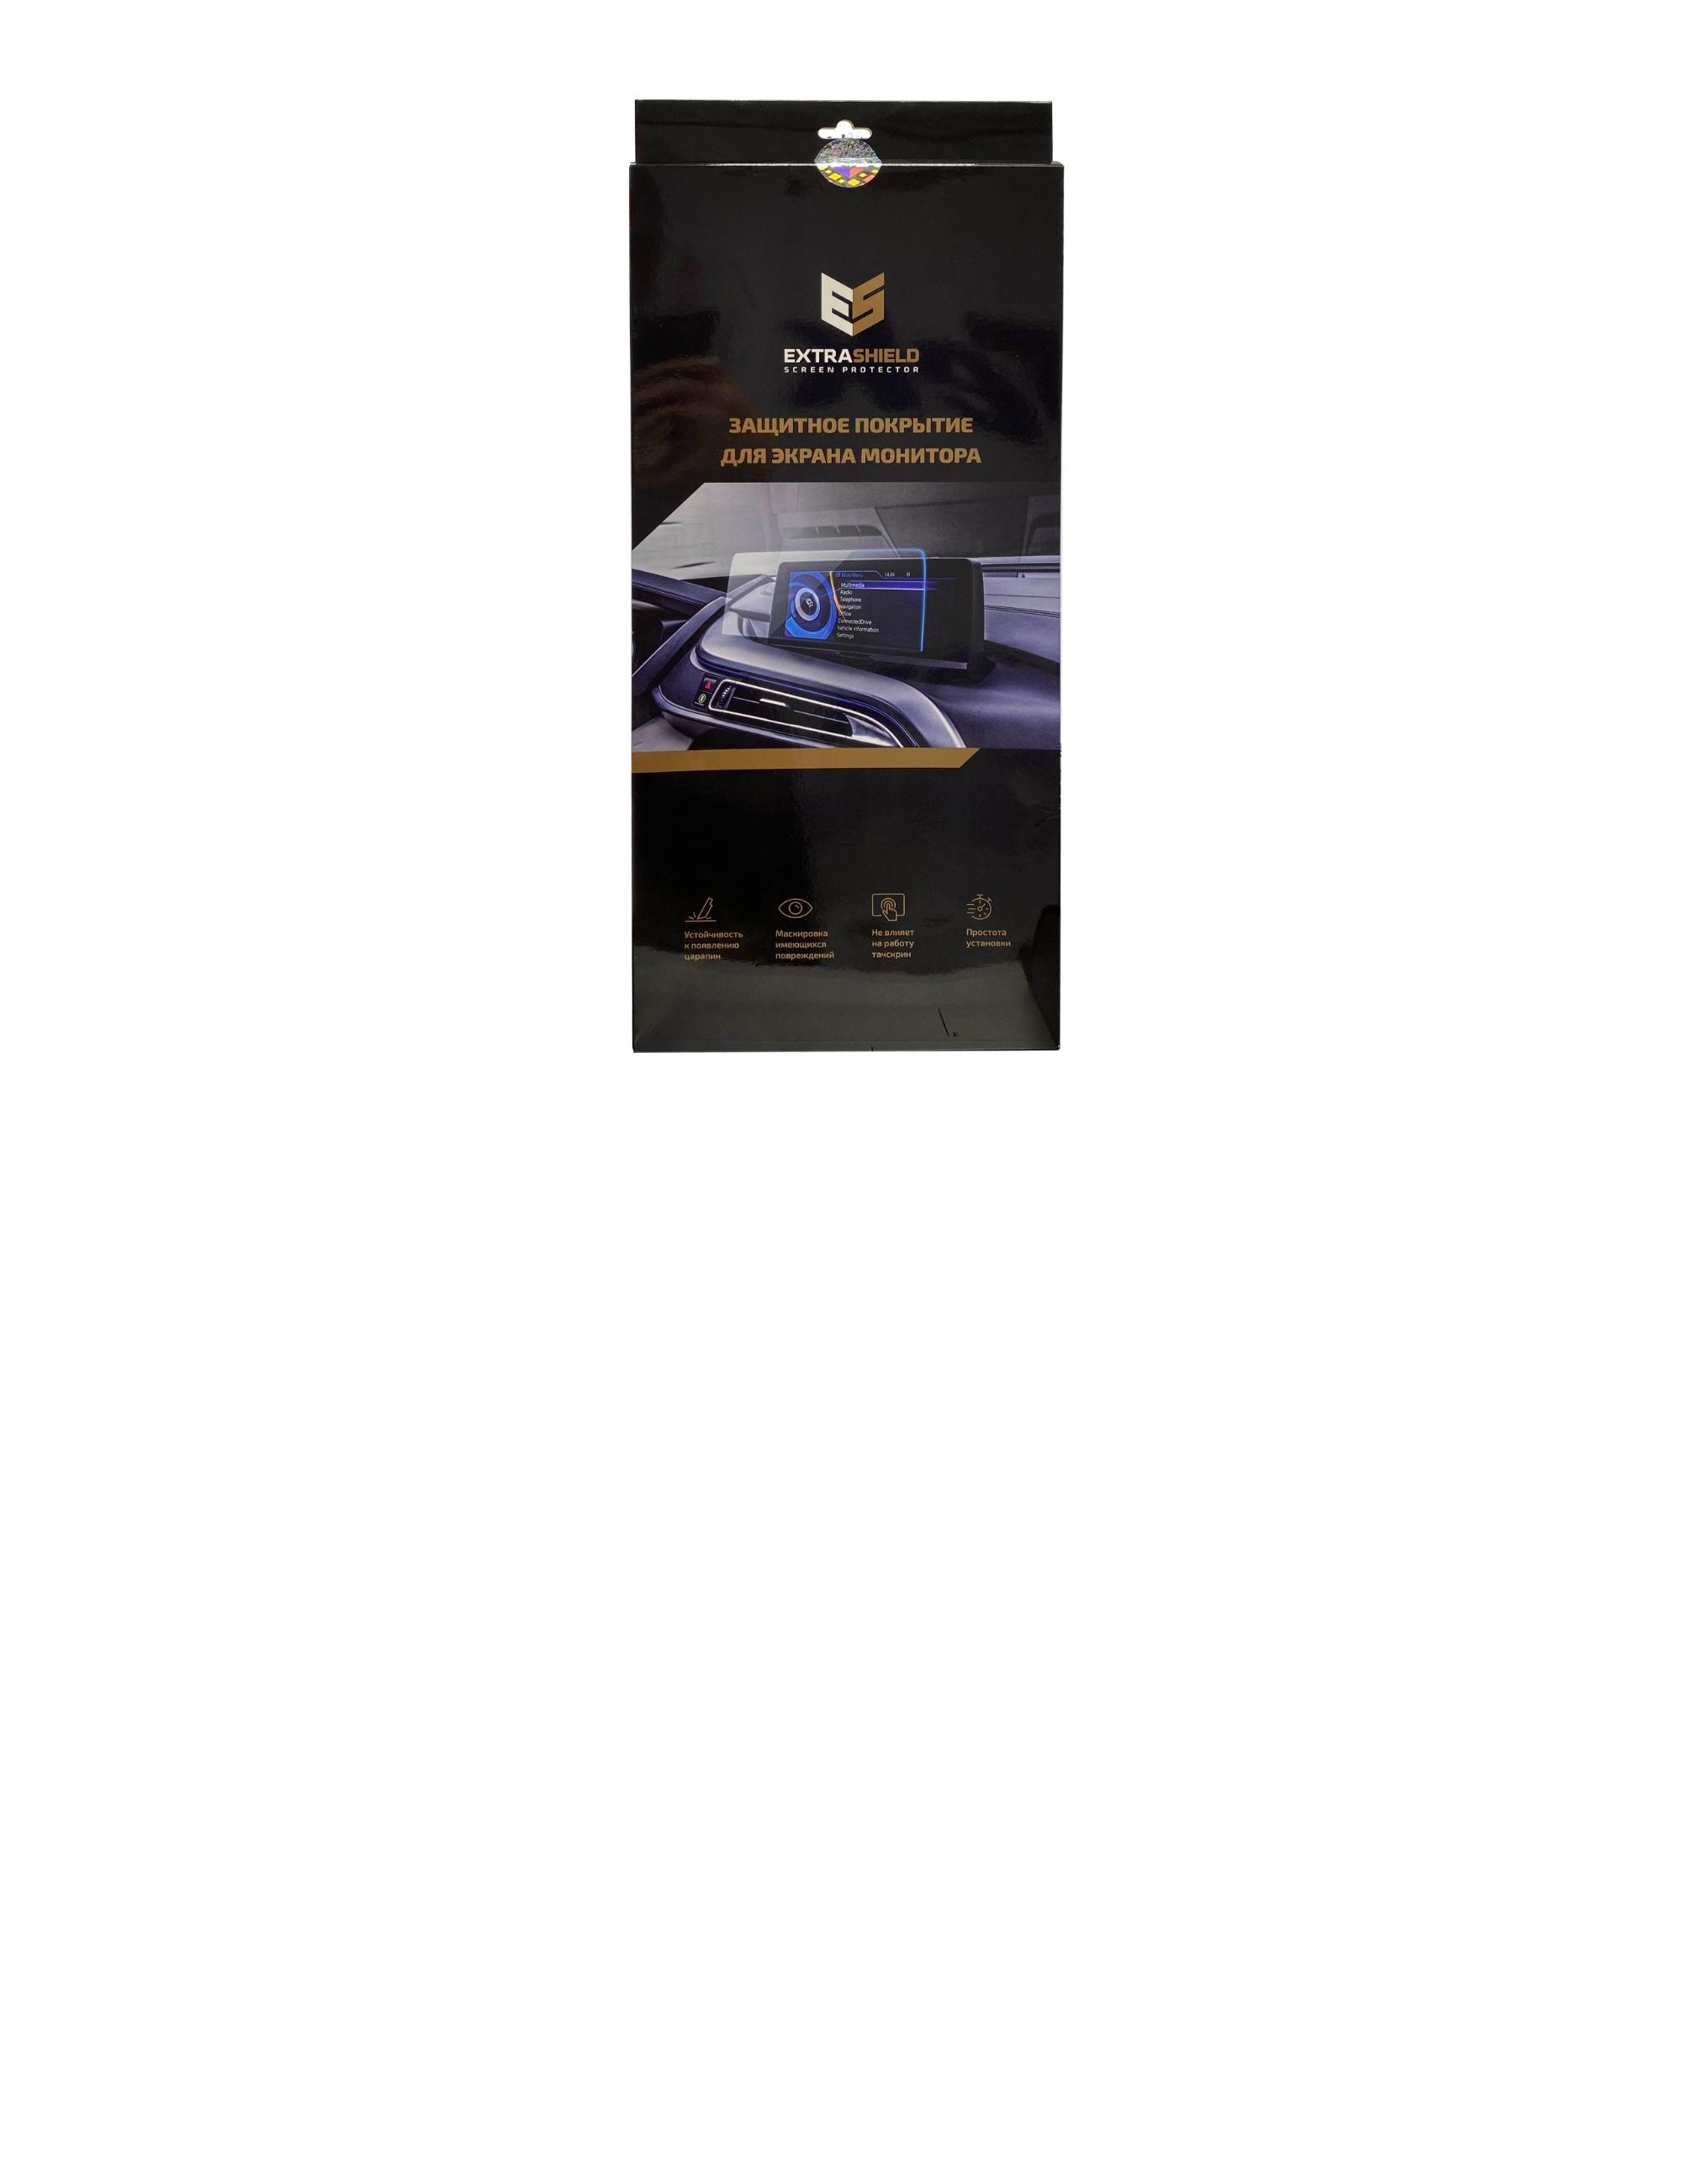 Mercedes-Benz E-class (W213) 2016 - н.в. приборная панель+мультимедиа 12,3 Защитное стекло Матовая